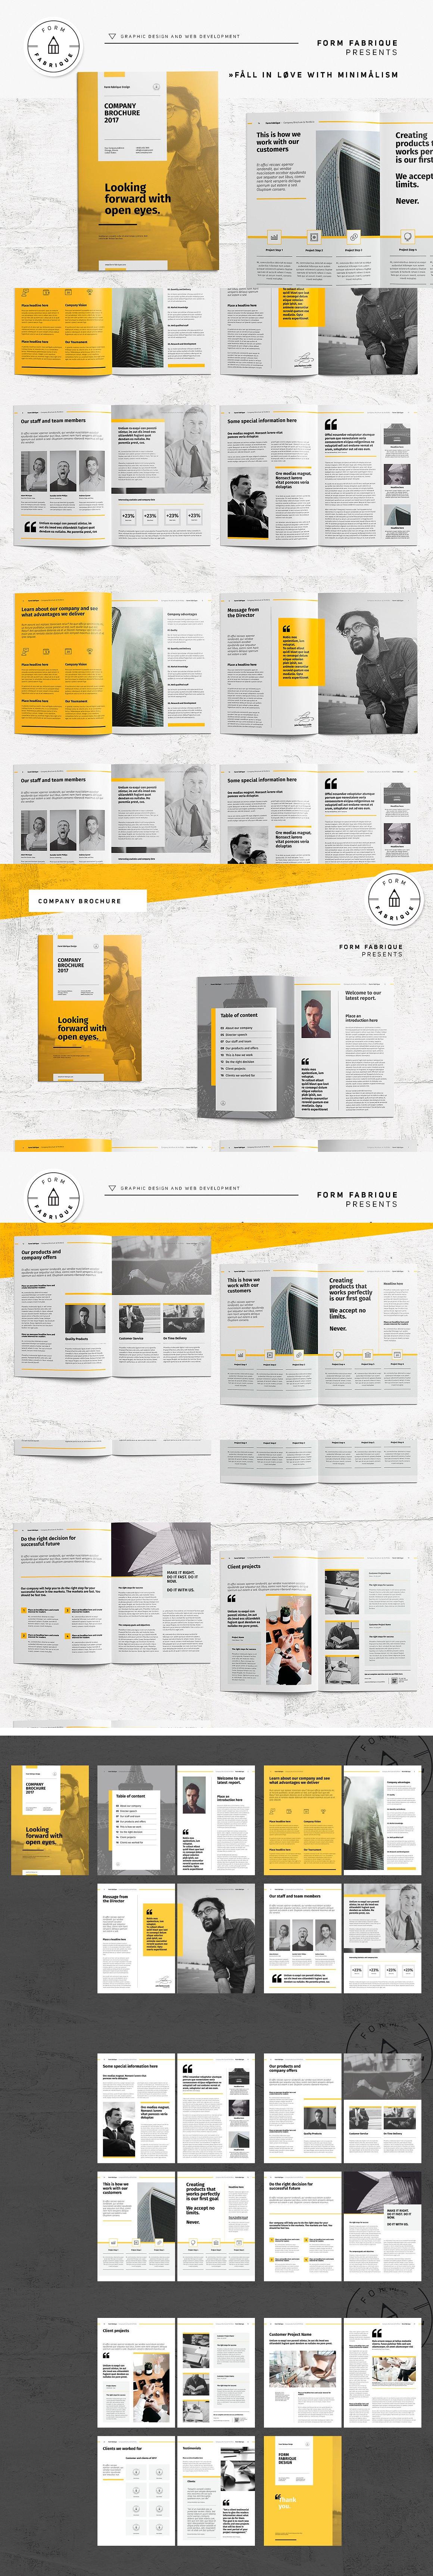 Company Brochure Template Pdf Indd  Brochure Design Templates